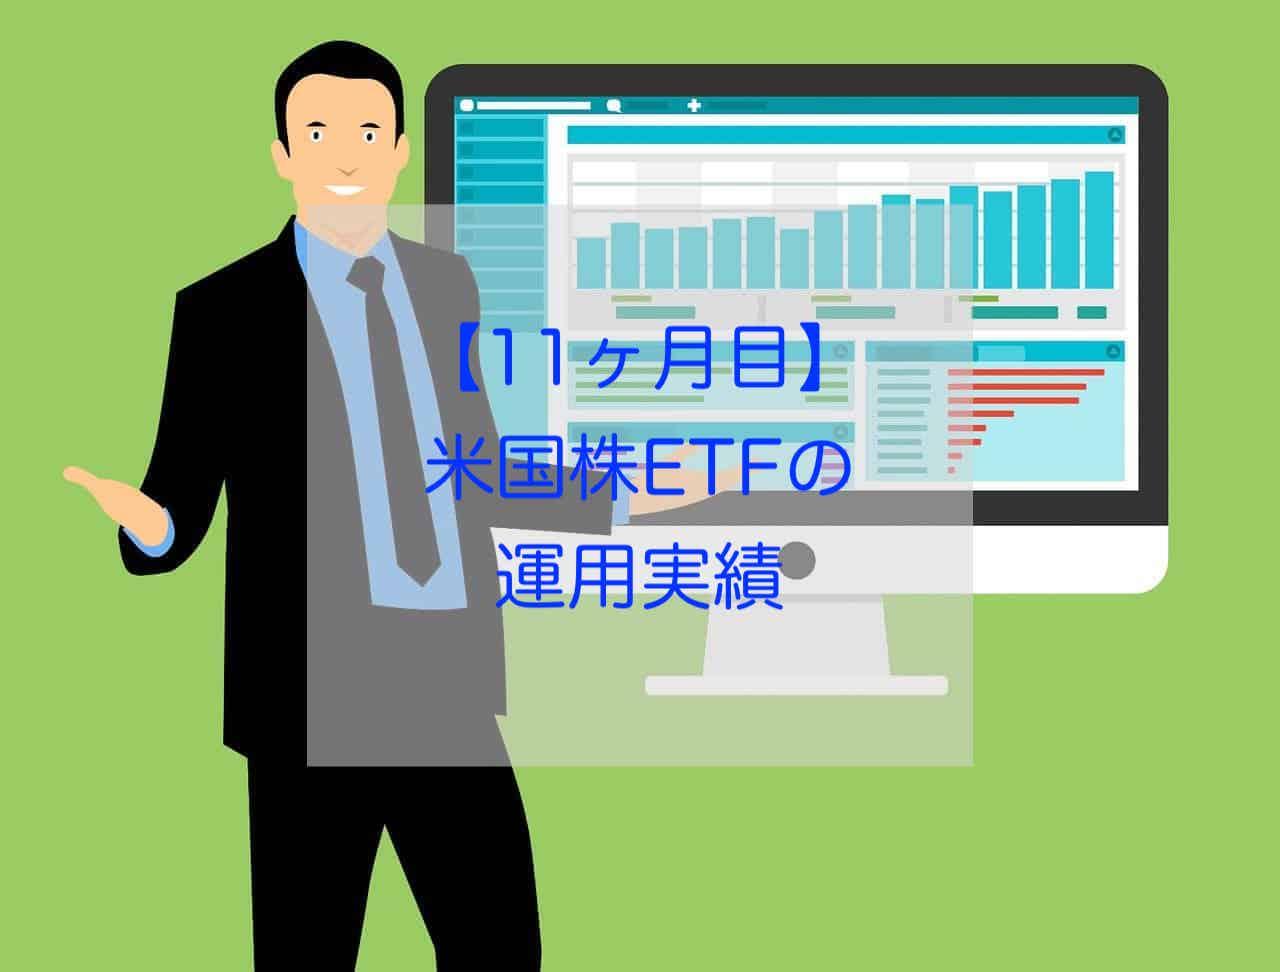 11ヶ月目の米国株ETF運用実績